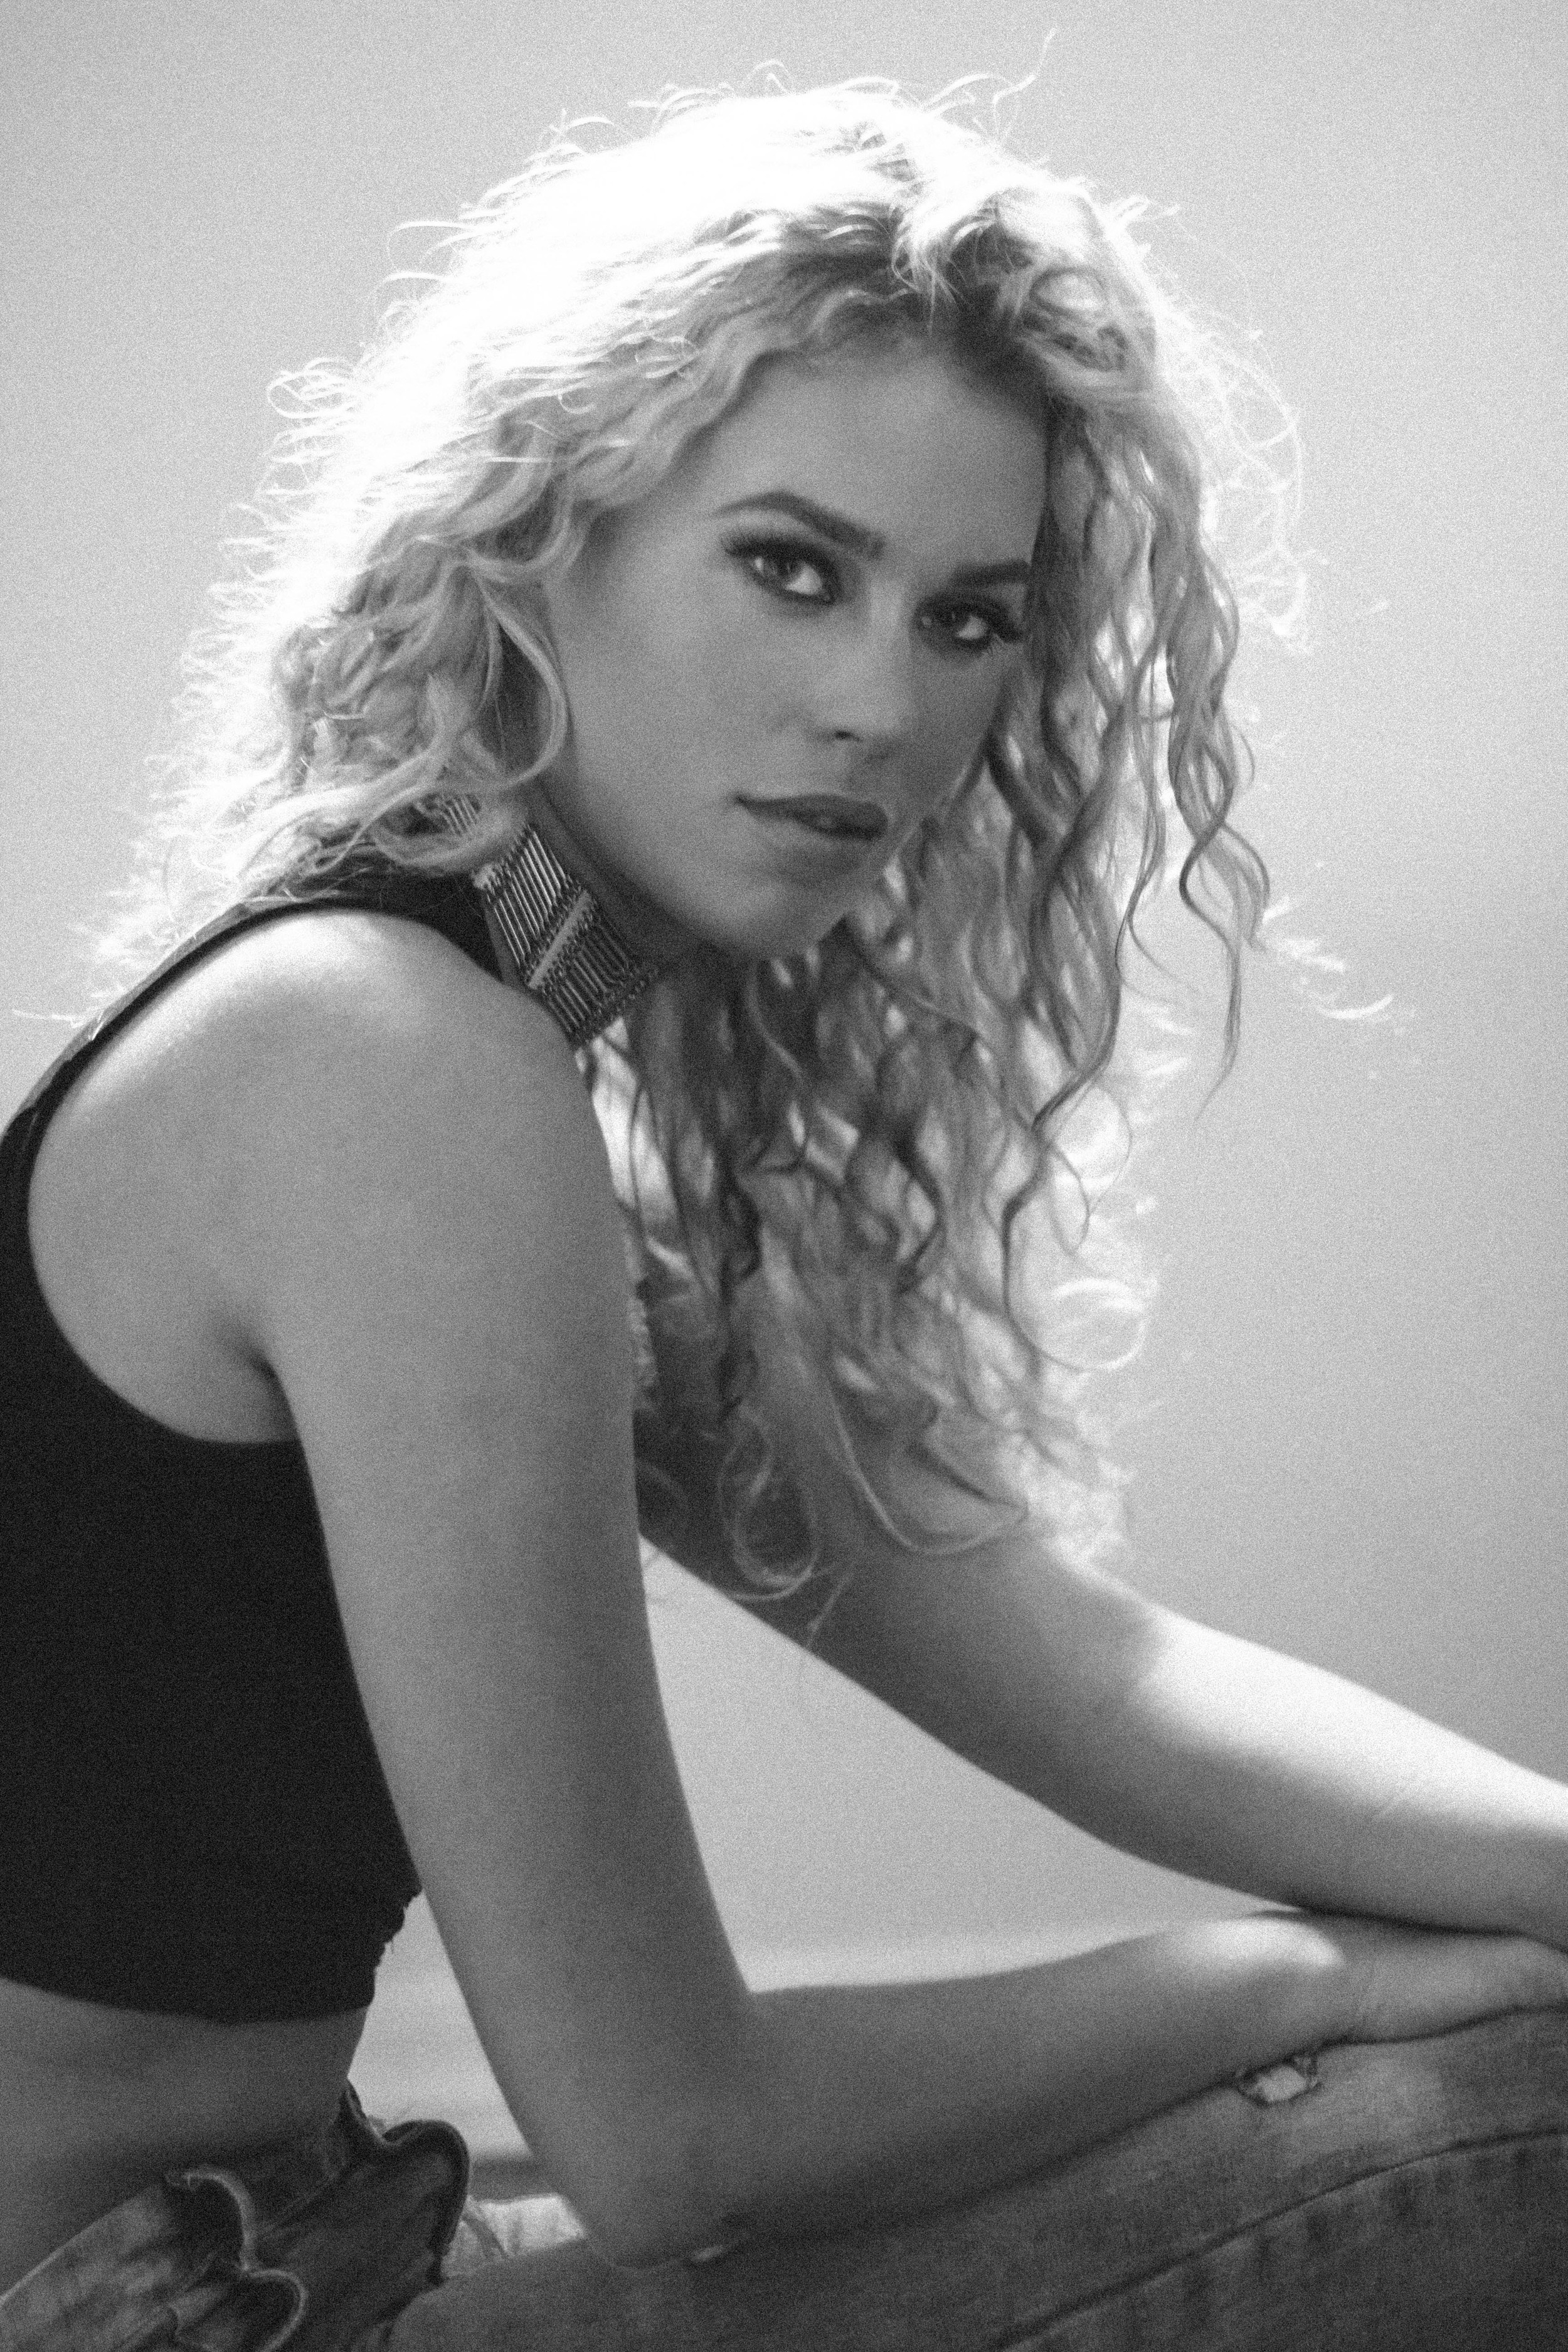 Emily Wilson Photography - Christa Sandstrom - Agency AZ